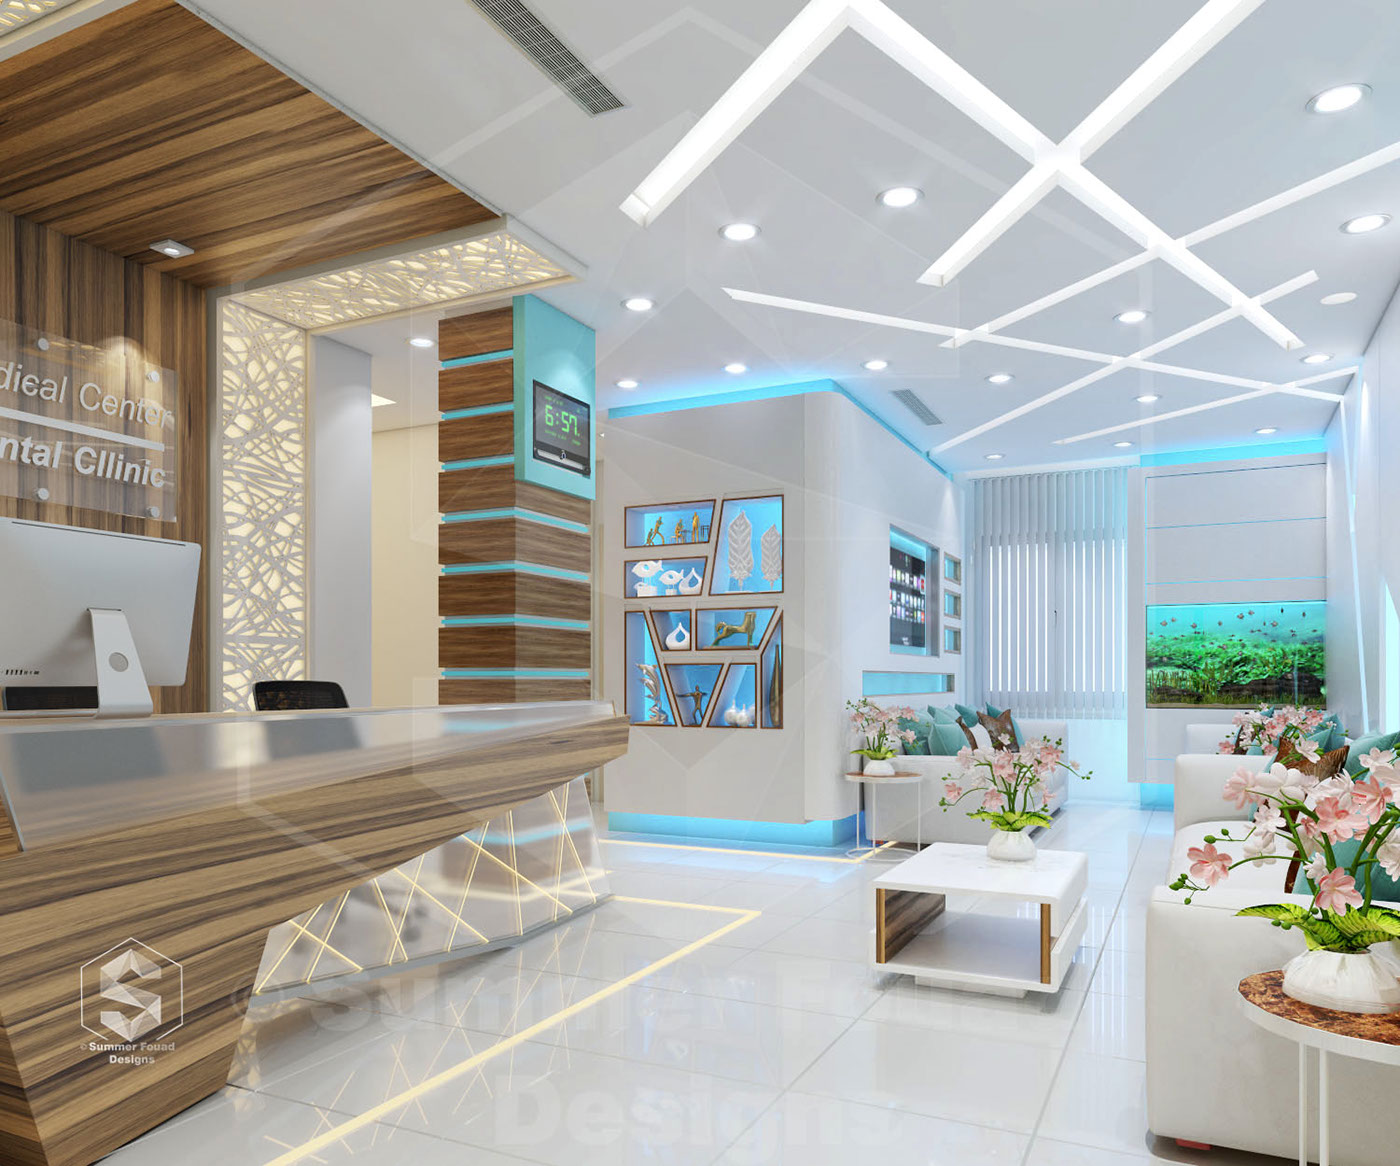 Clinic S Interior Design On Behance